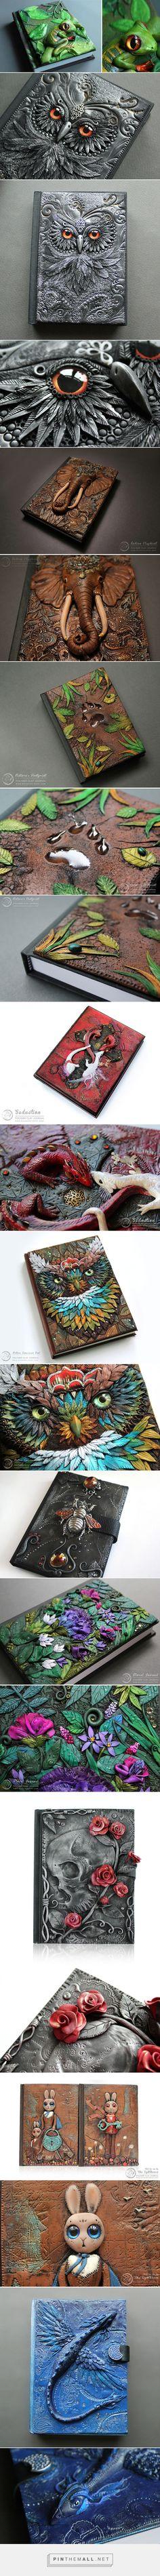 Fairytale Book Covers By Latvian Artist Aniko Kolesnikova   Bored Panda